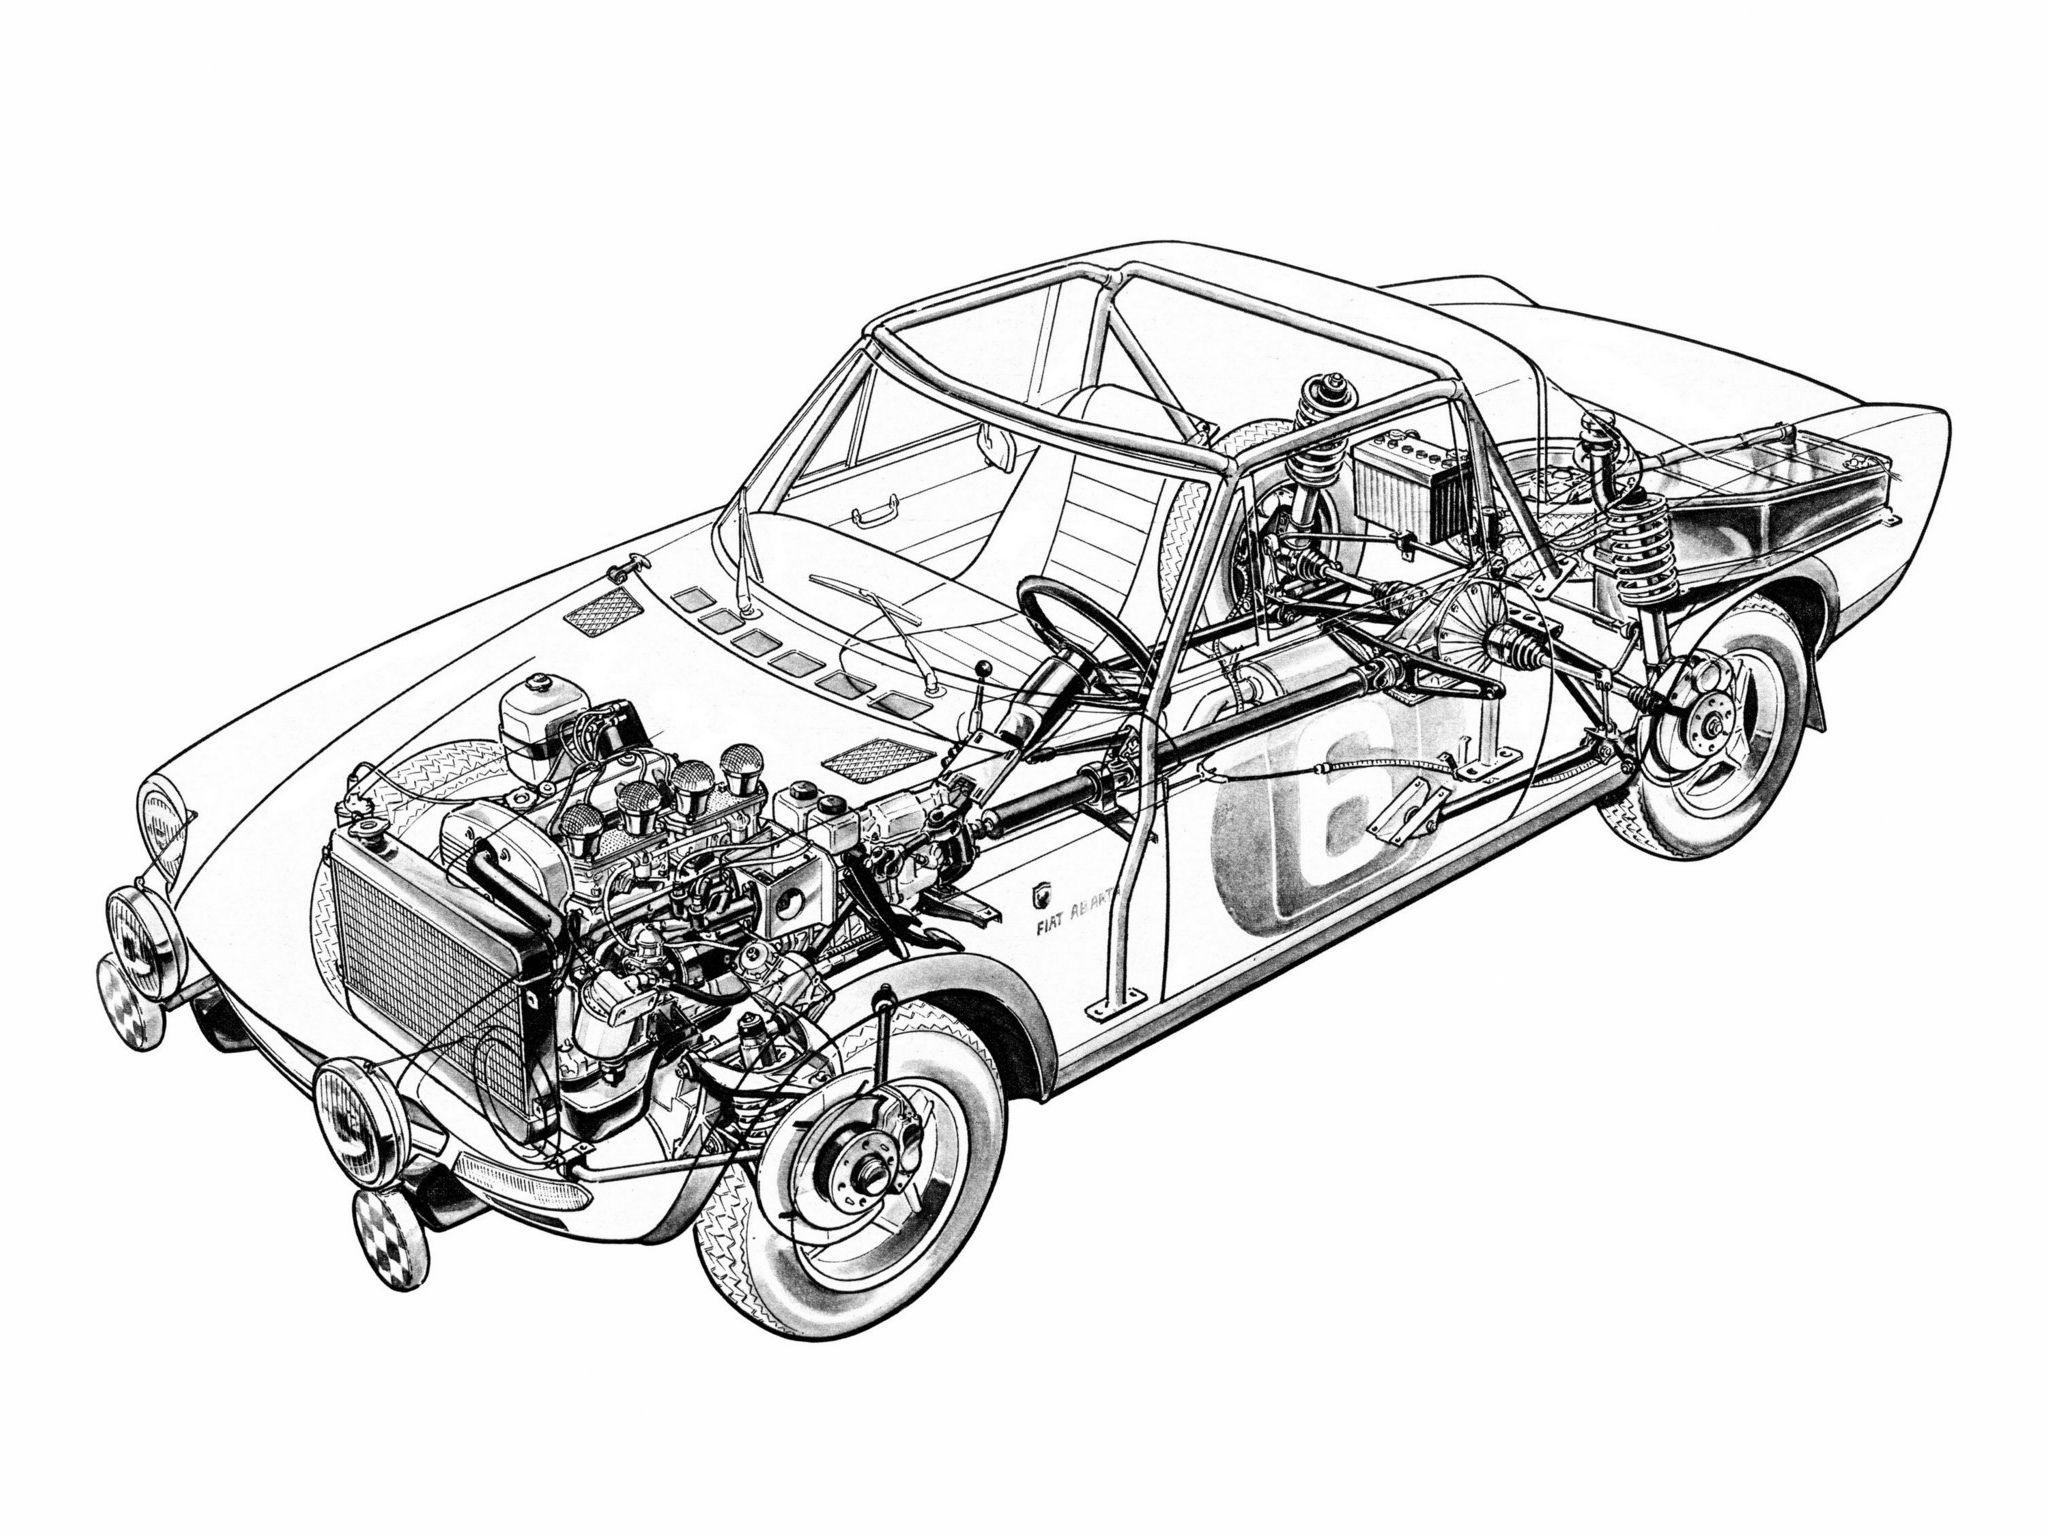 75 Fiat Abarth 124 Rally Designed By Pininfarina